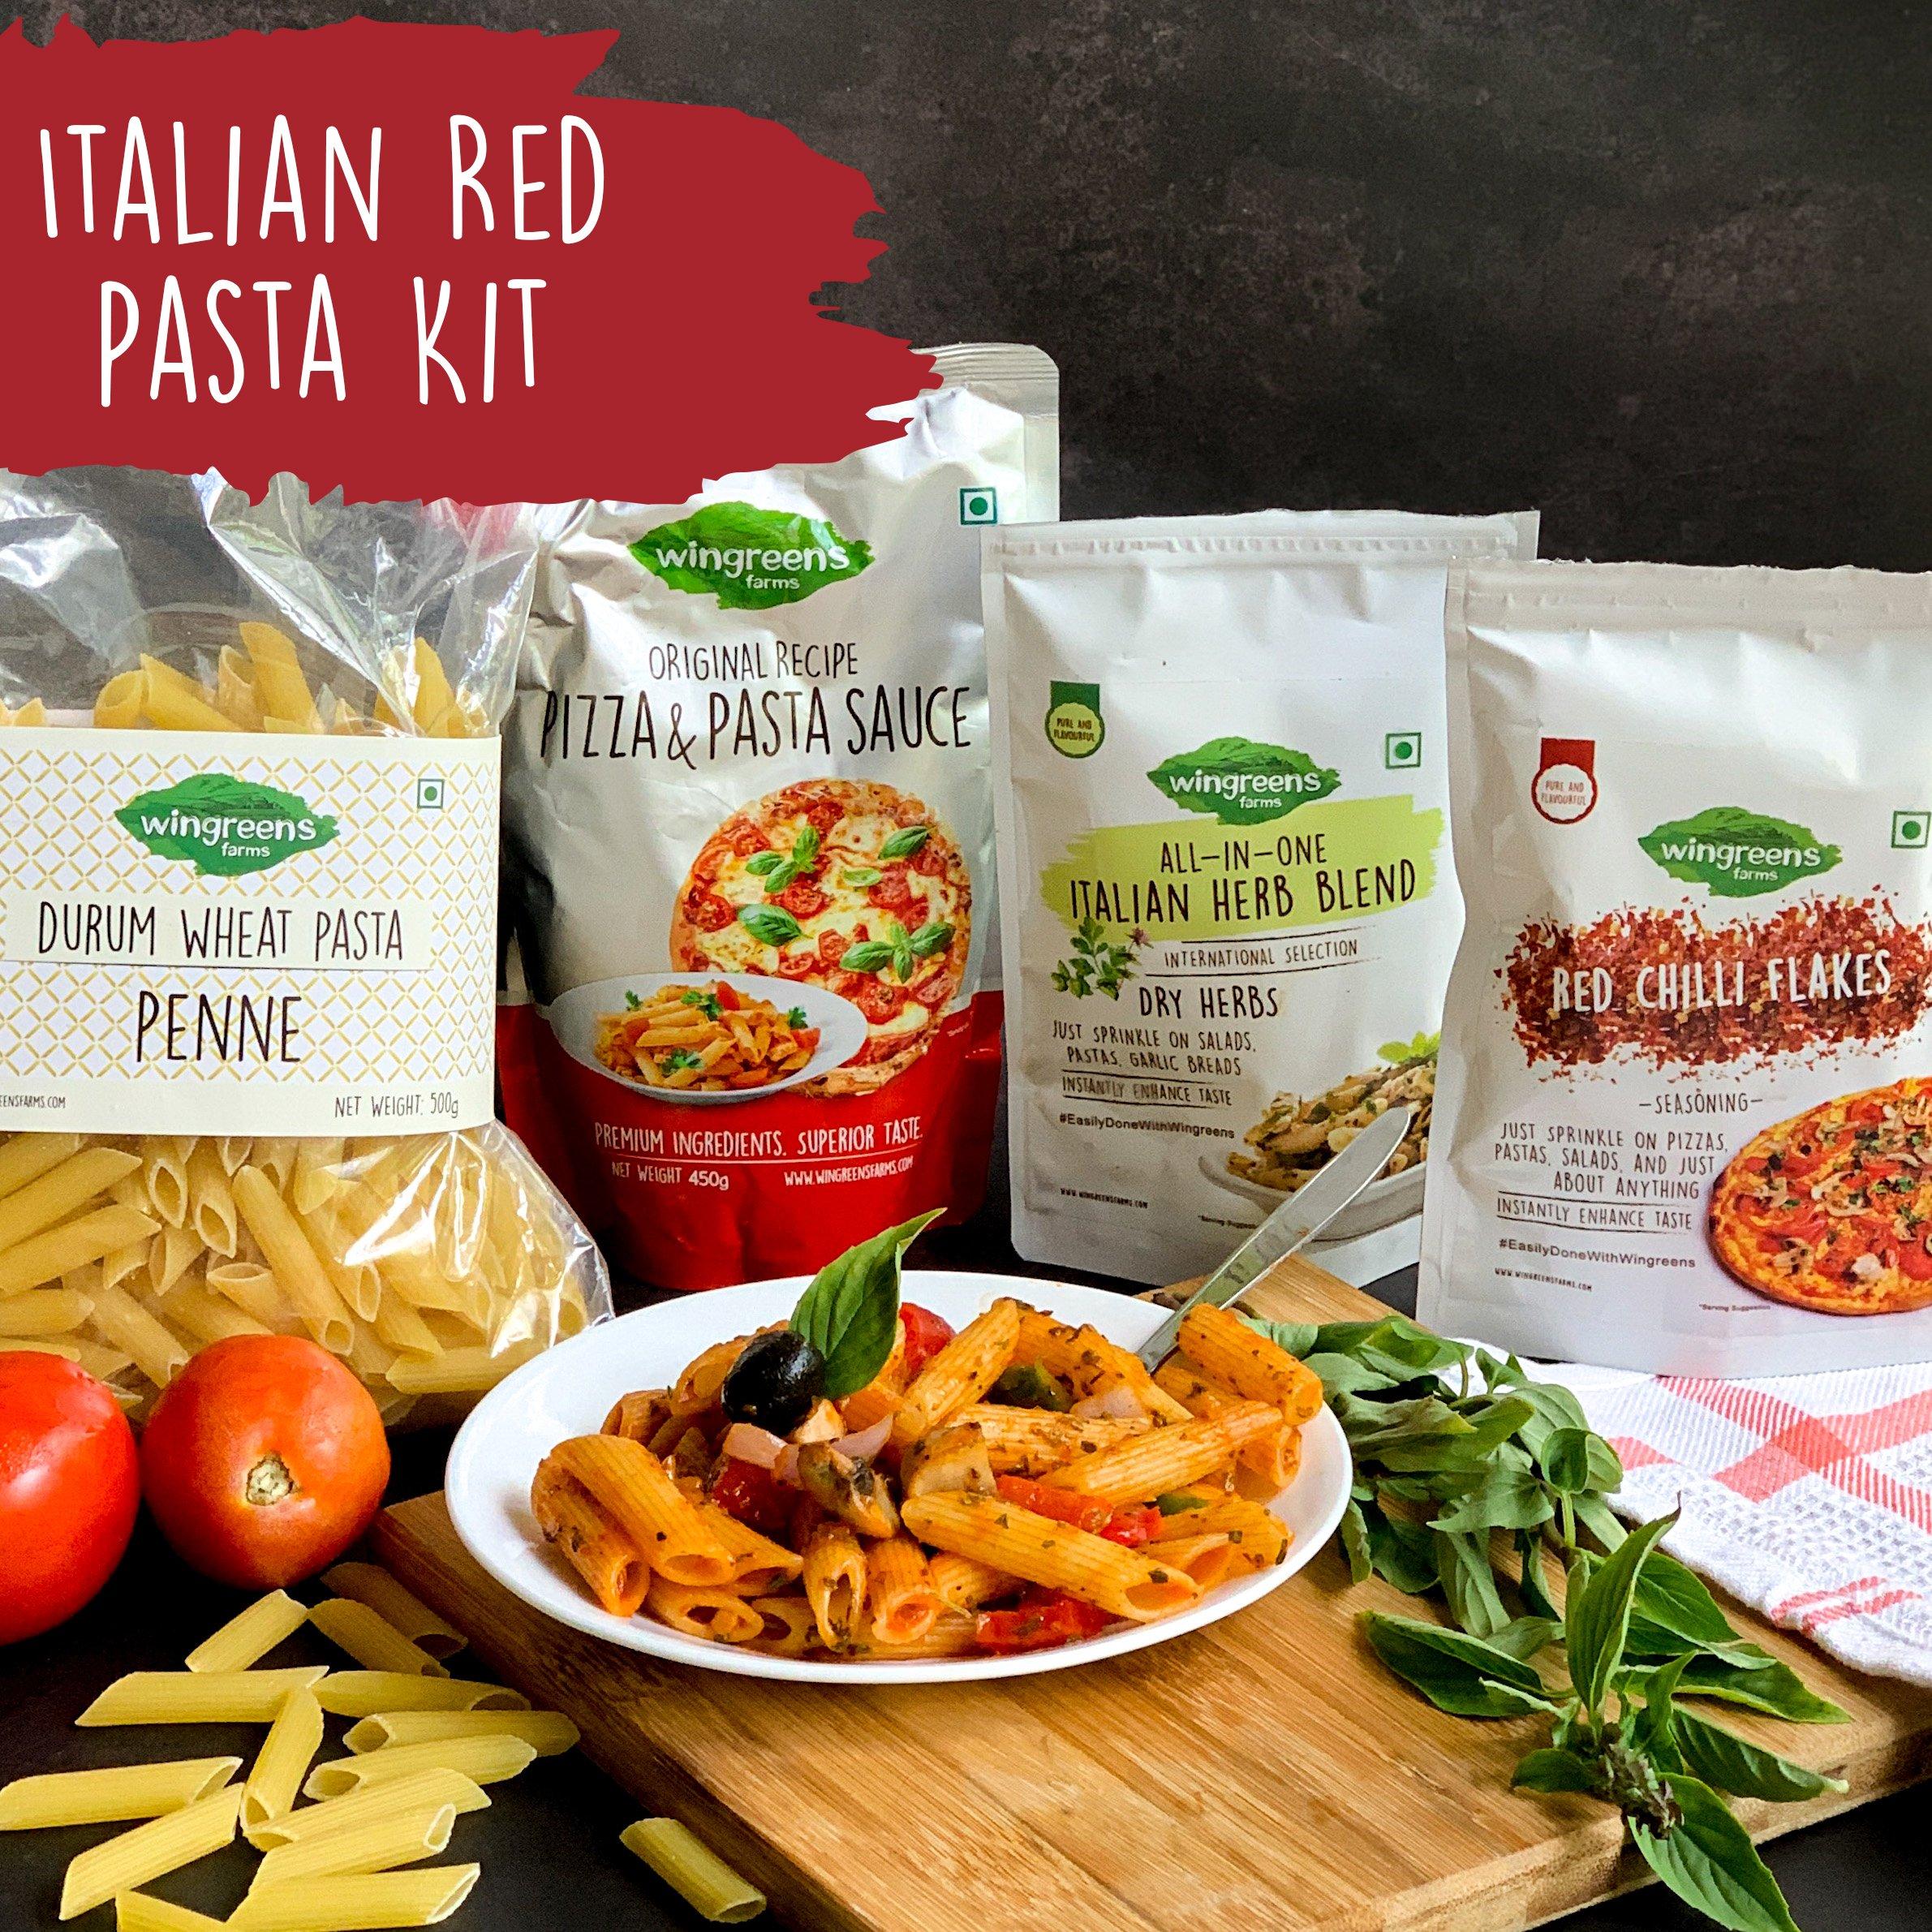 Italian Red Pasta Kit (930g)